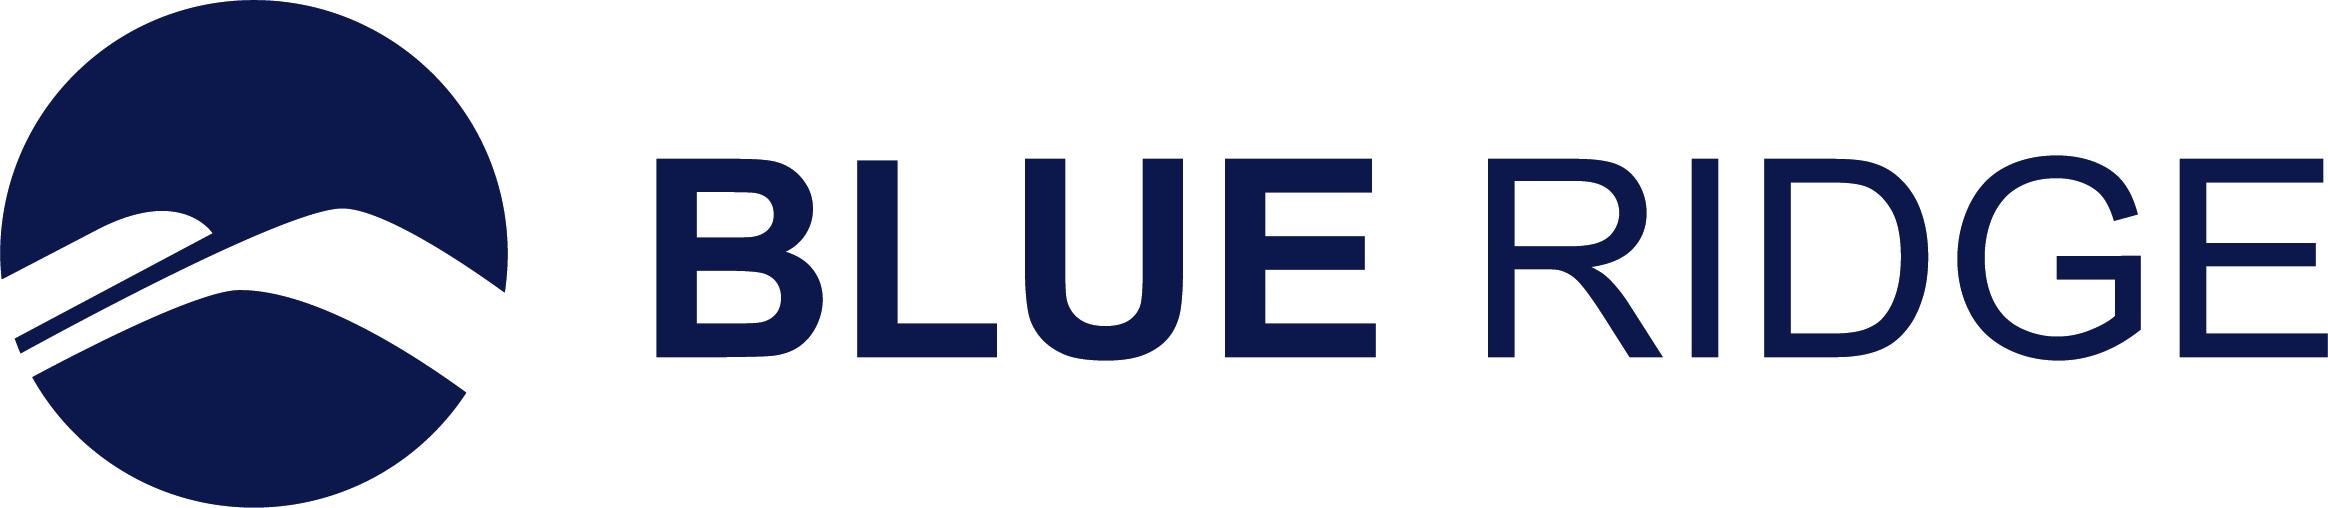 Santhosh Srirambhatla CTO for Blue Ridge Leads Company in Product Development